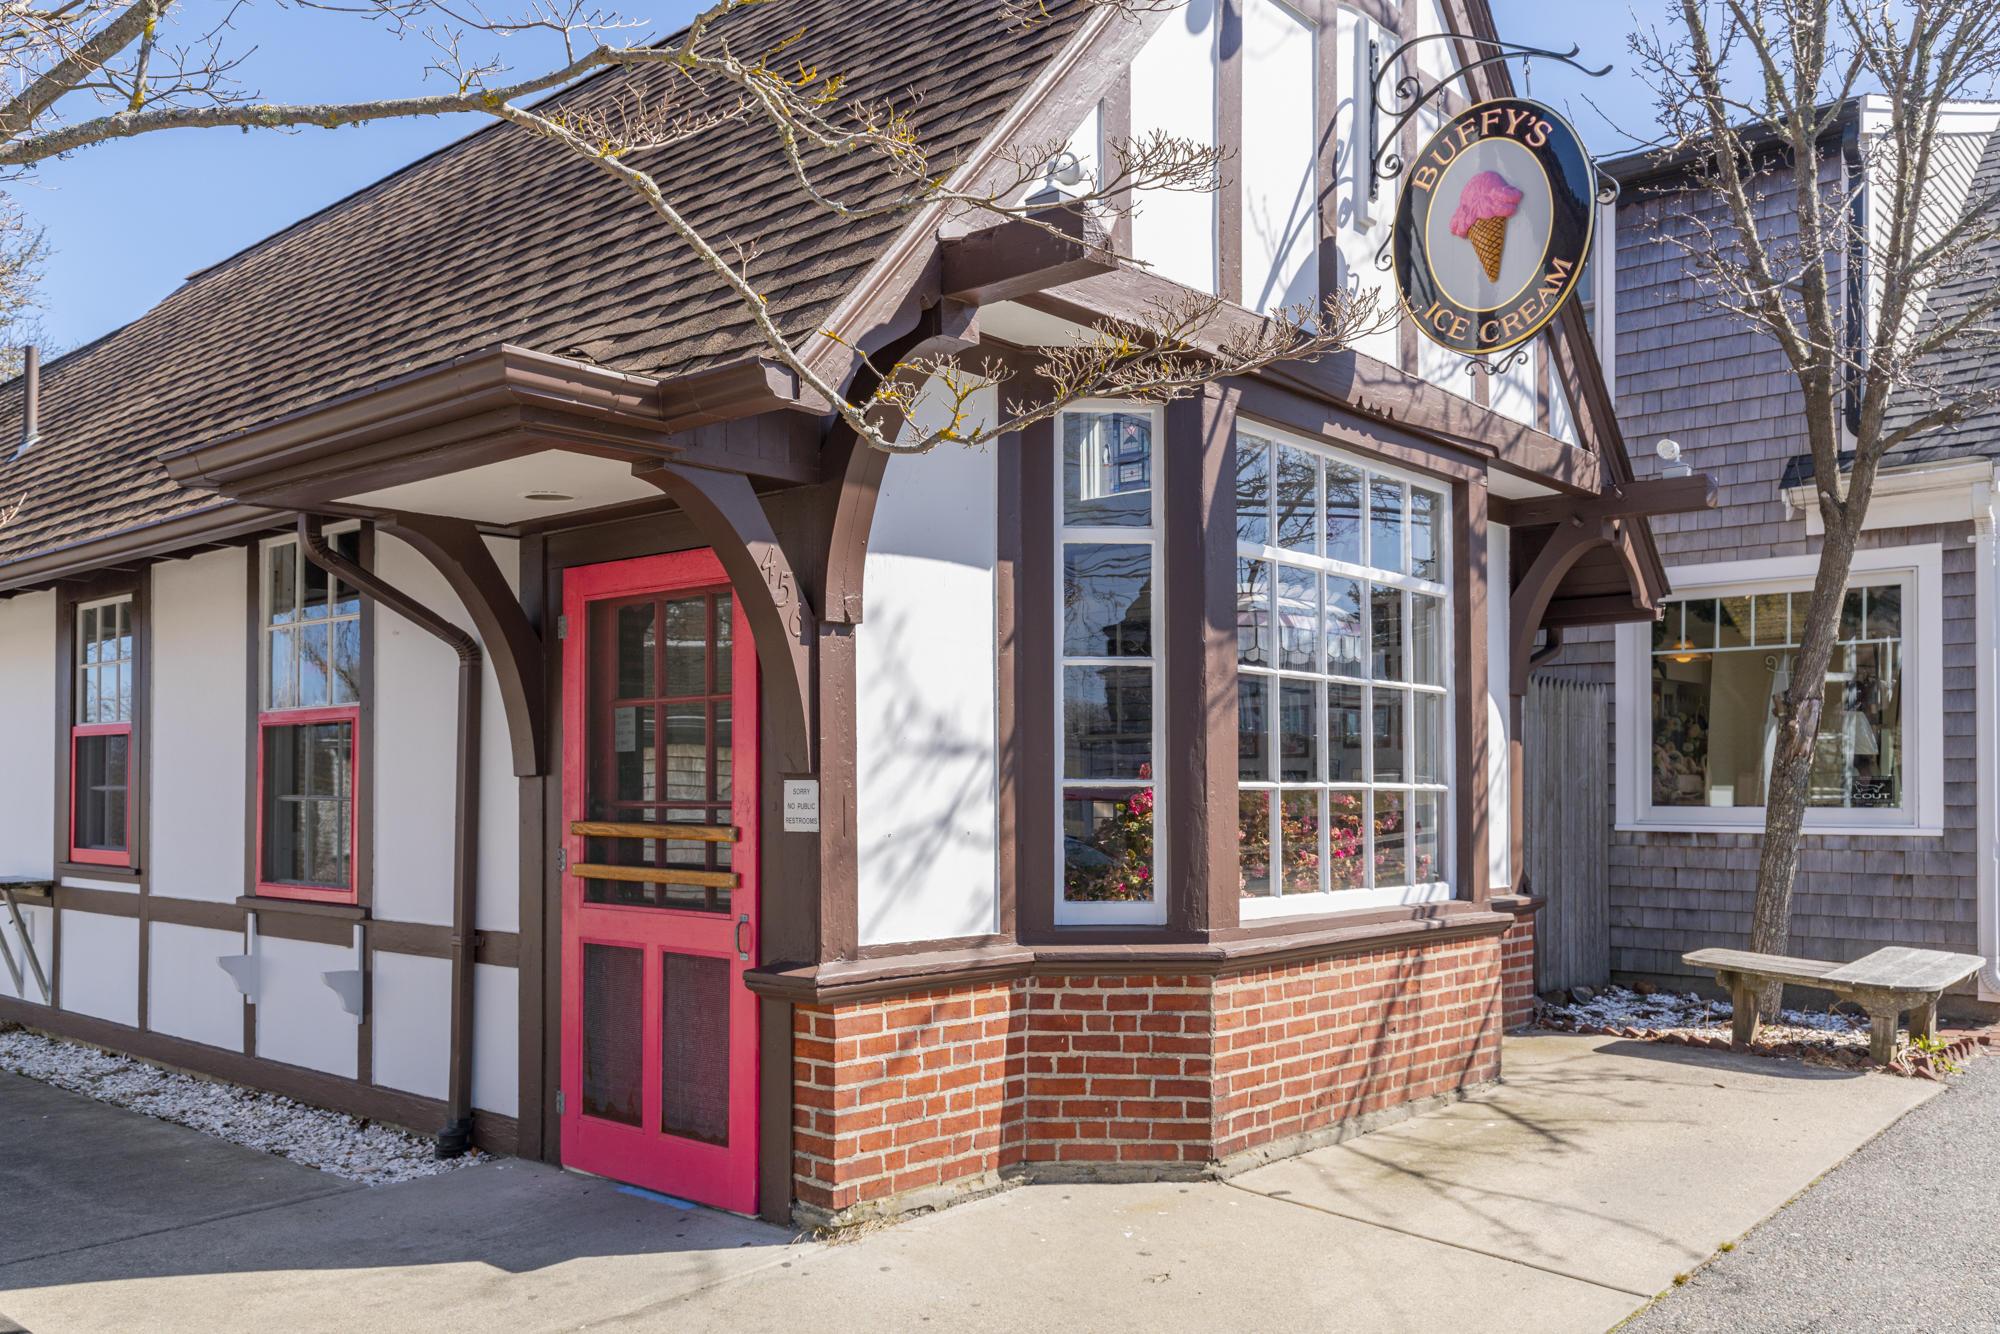 456 Main Street, Chatham, MA  02633 - slide 10